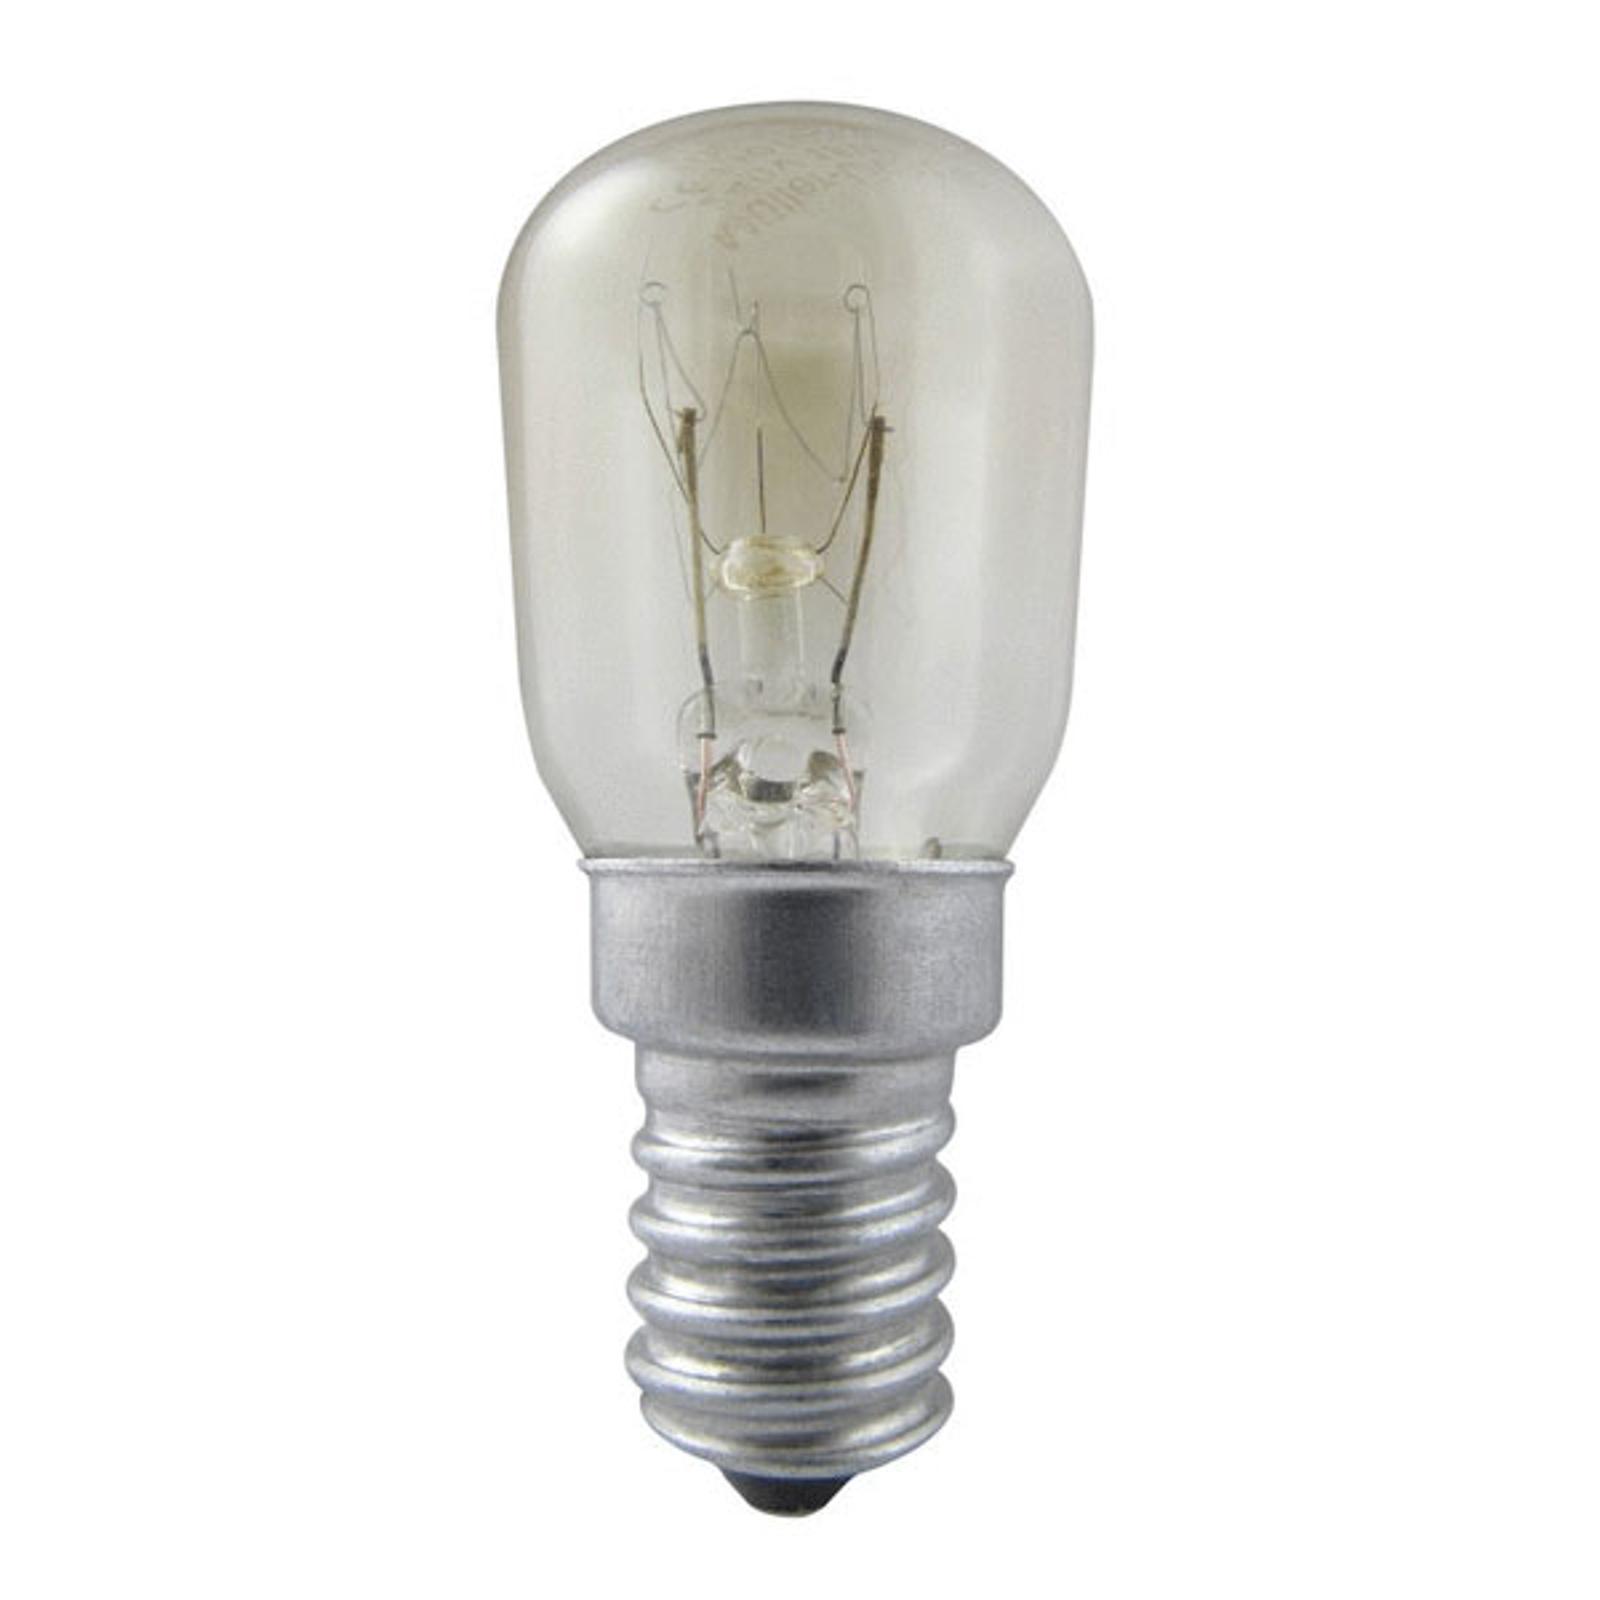 E14 15W Kühlschranklampe, klar, dimmbar